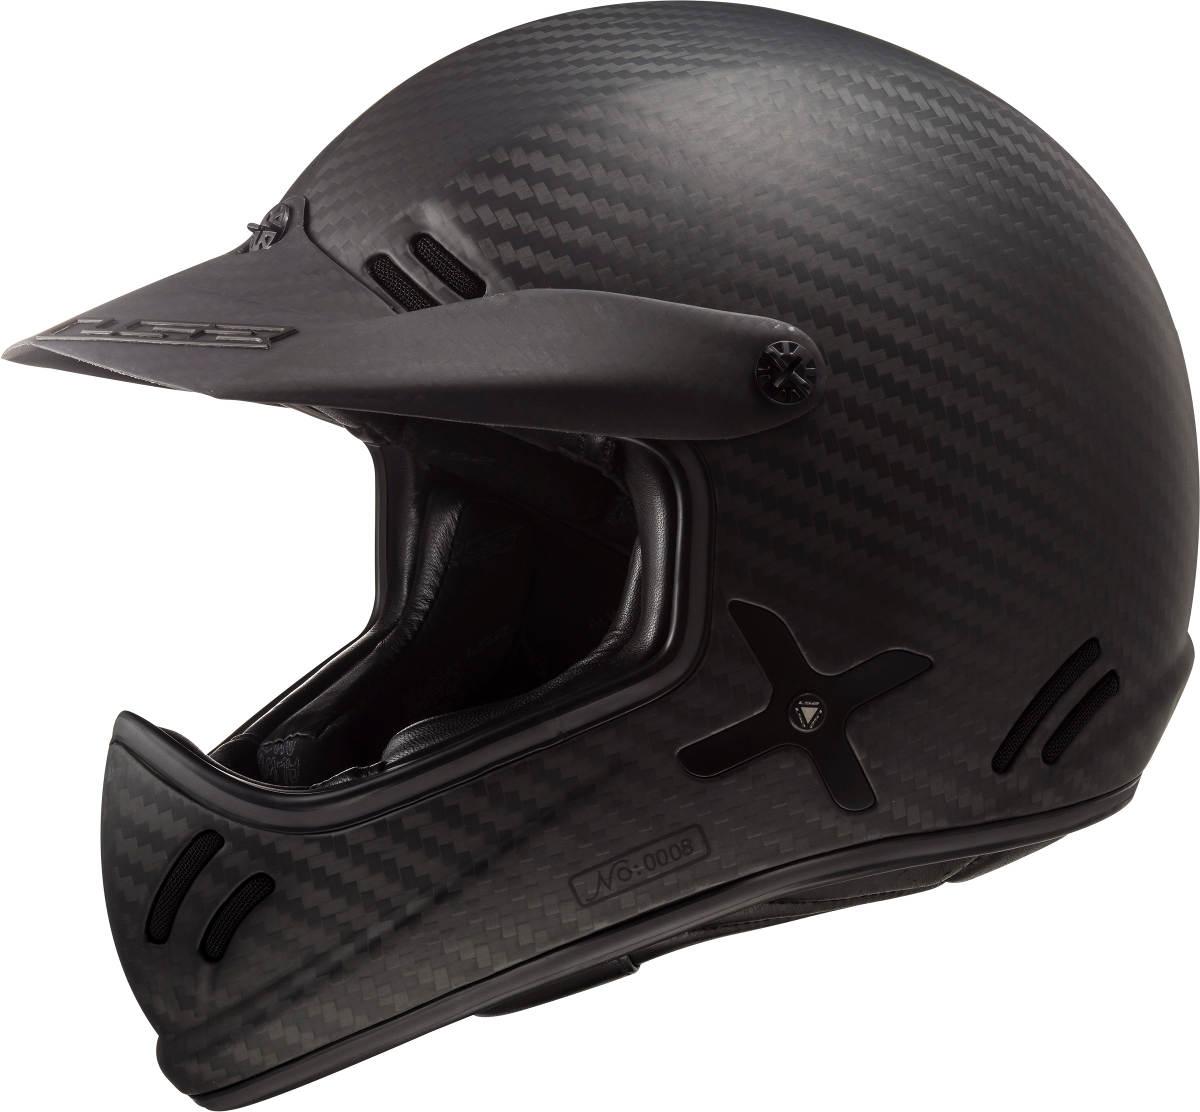 The LS2 Xtra Motorcycle Helmet Left Side